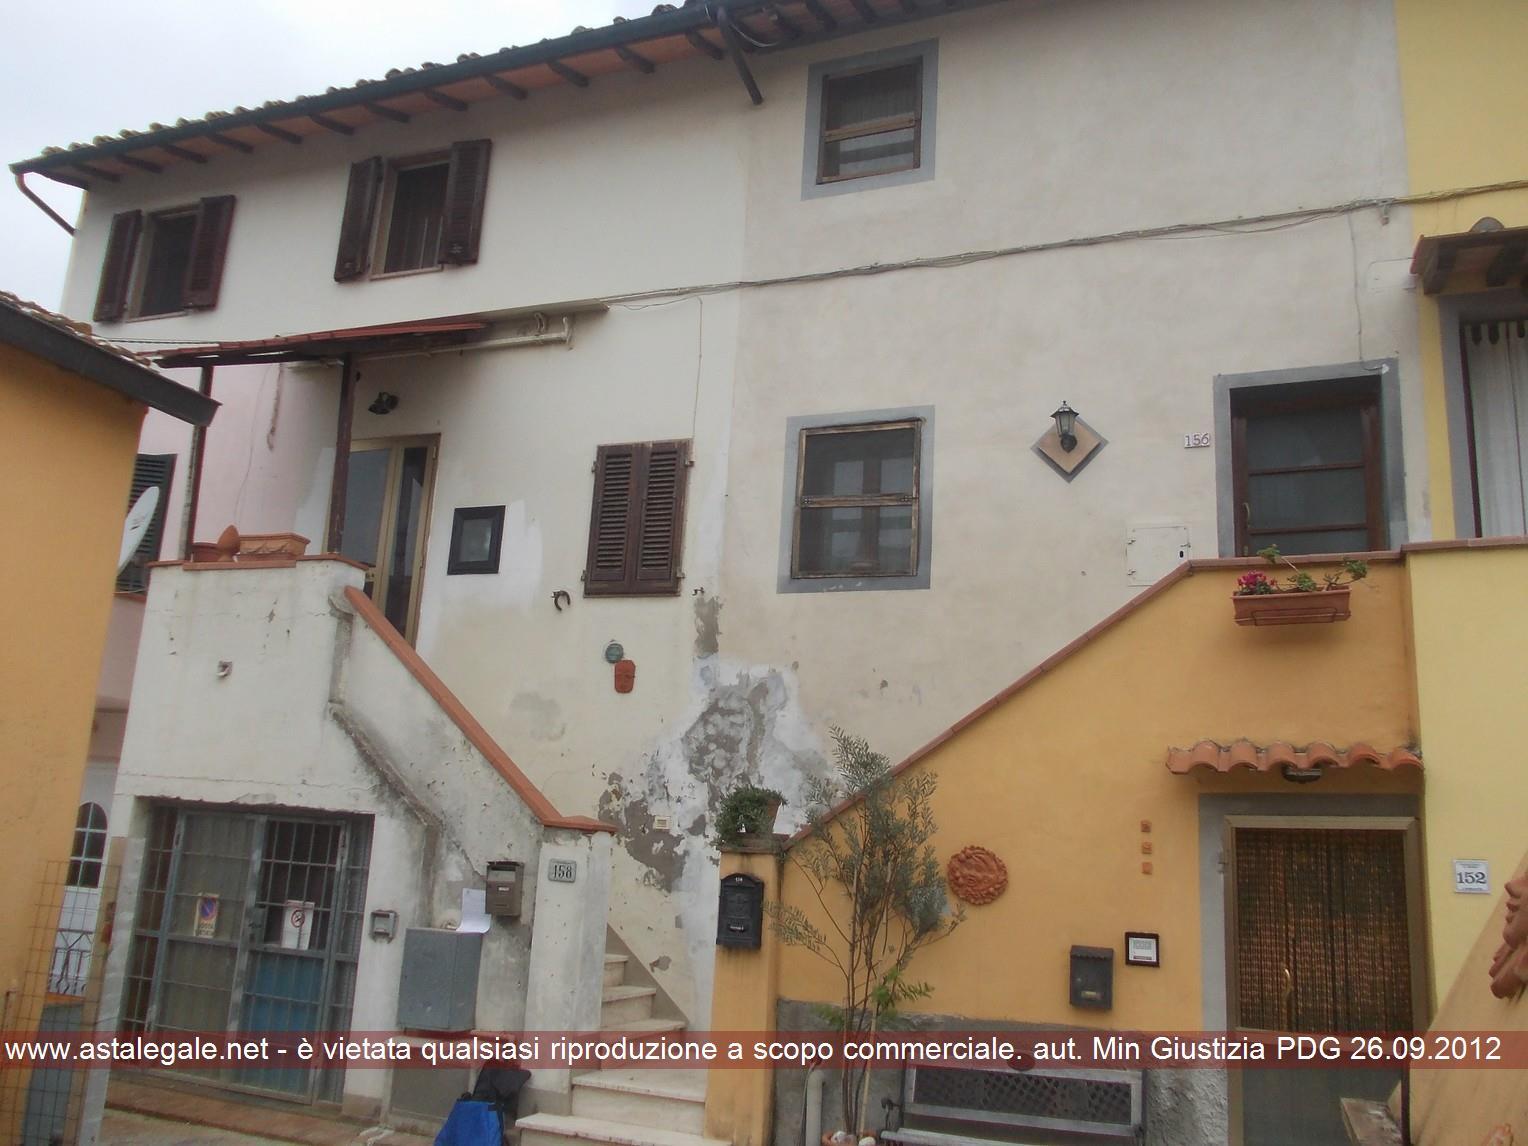 Fucecchio (FI) Localita' San Pierino - Via Sanminiatese 158